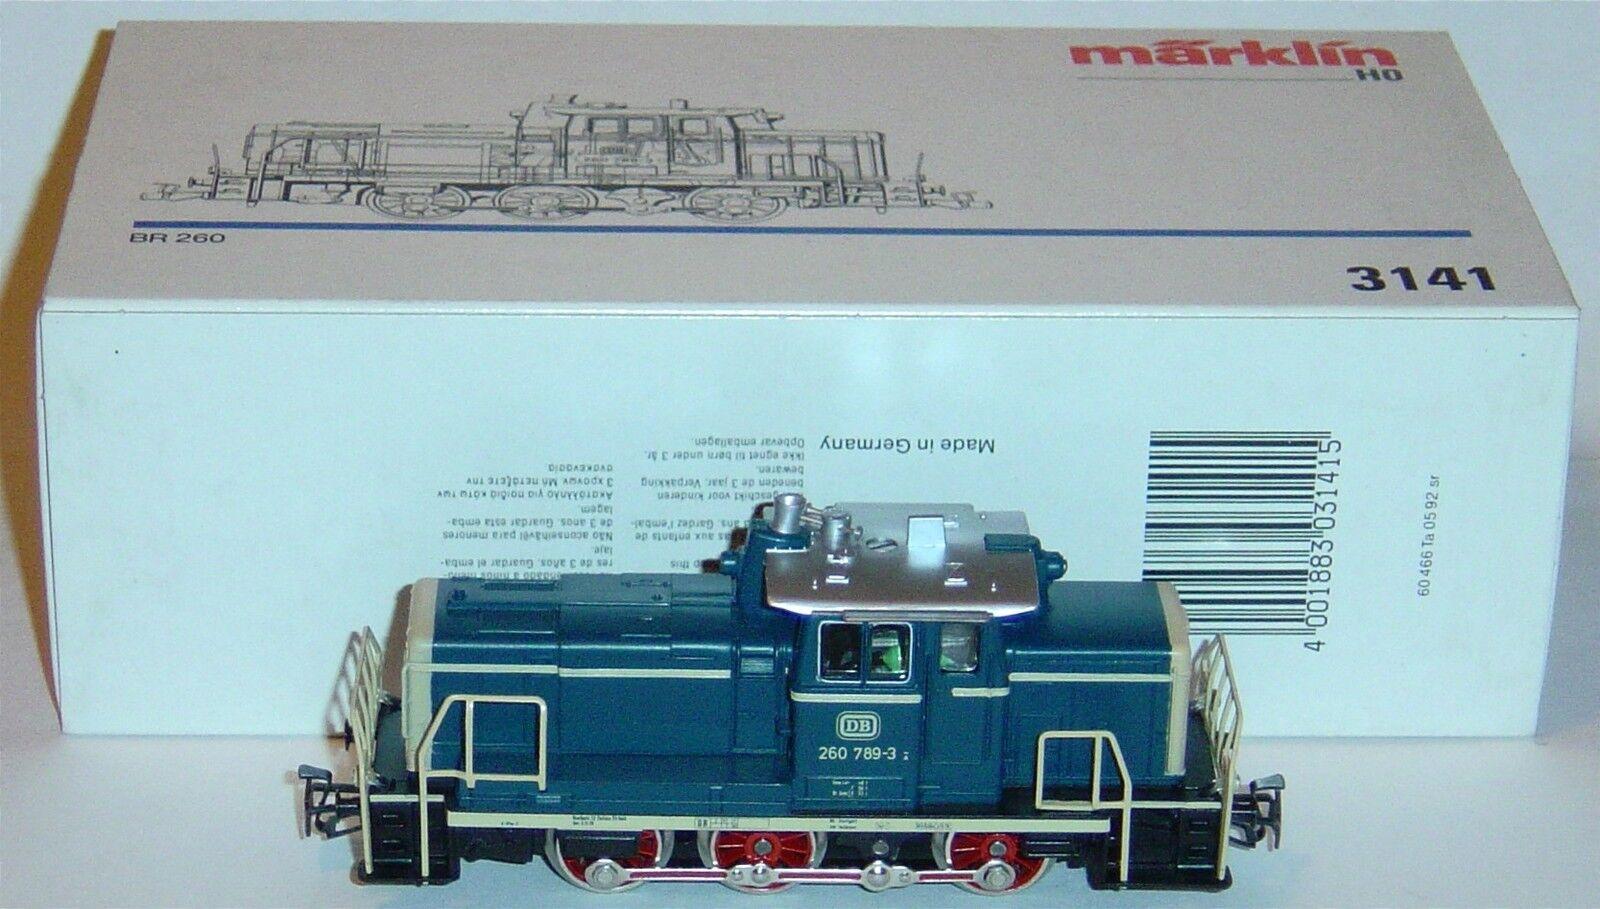 Marklin ho, diesel locomotive ref 3141 with new motor 5 pole, digitized